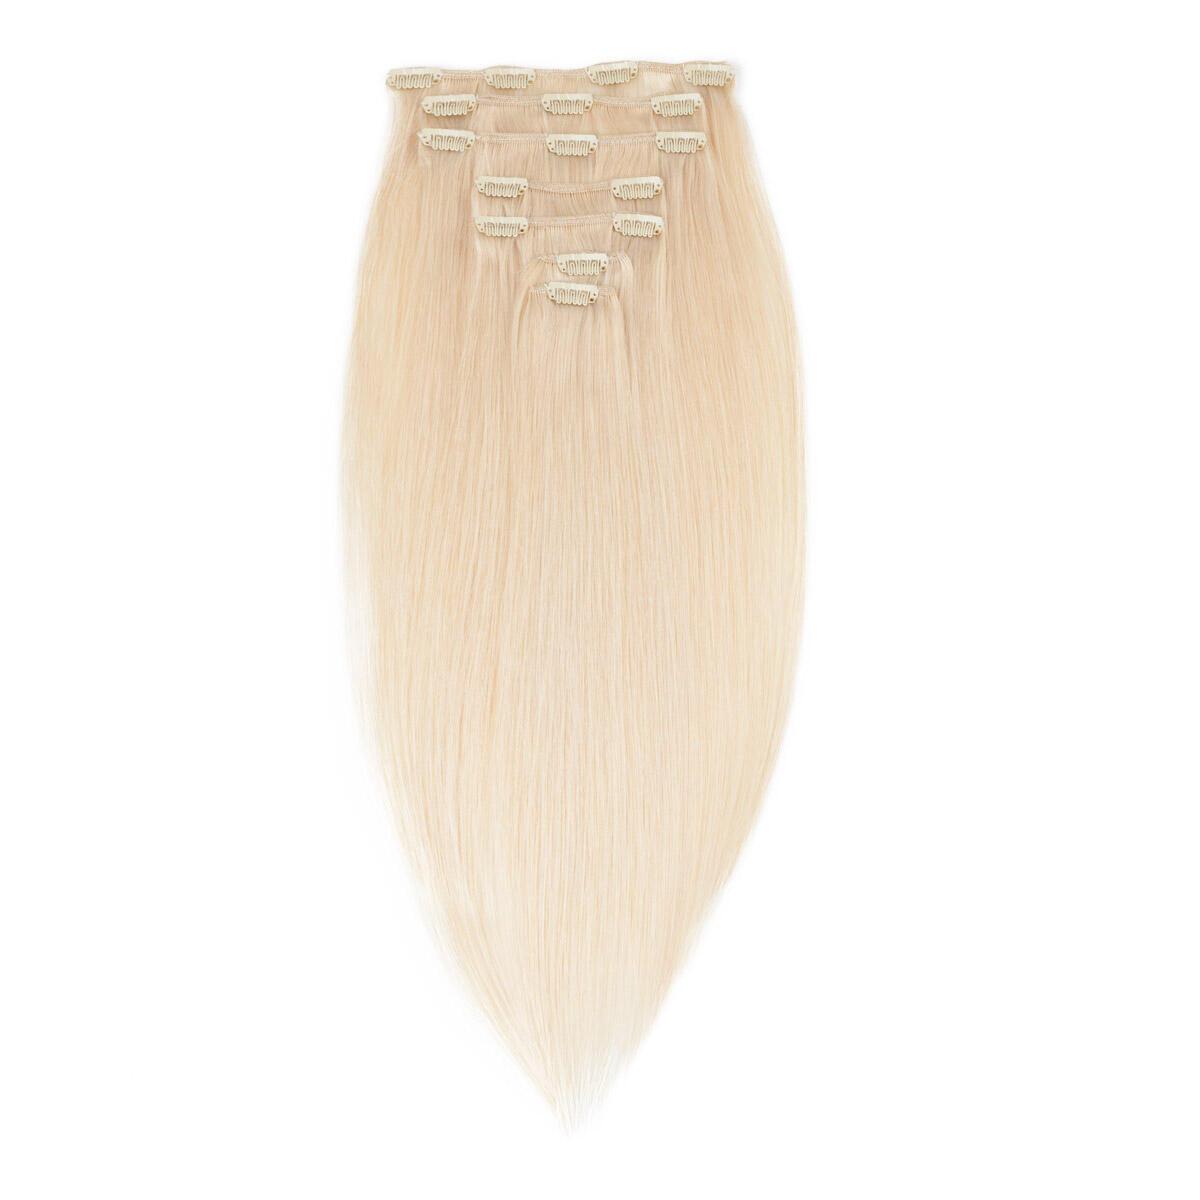 Clip-on Set Premium 7 pieces 10.8 Light Blonde 50 cm